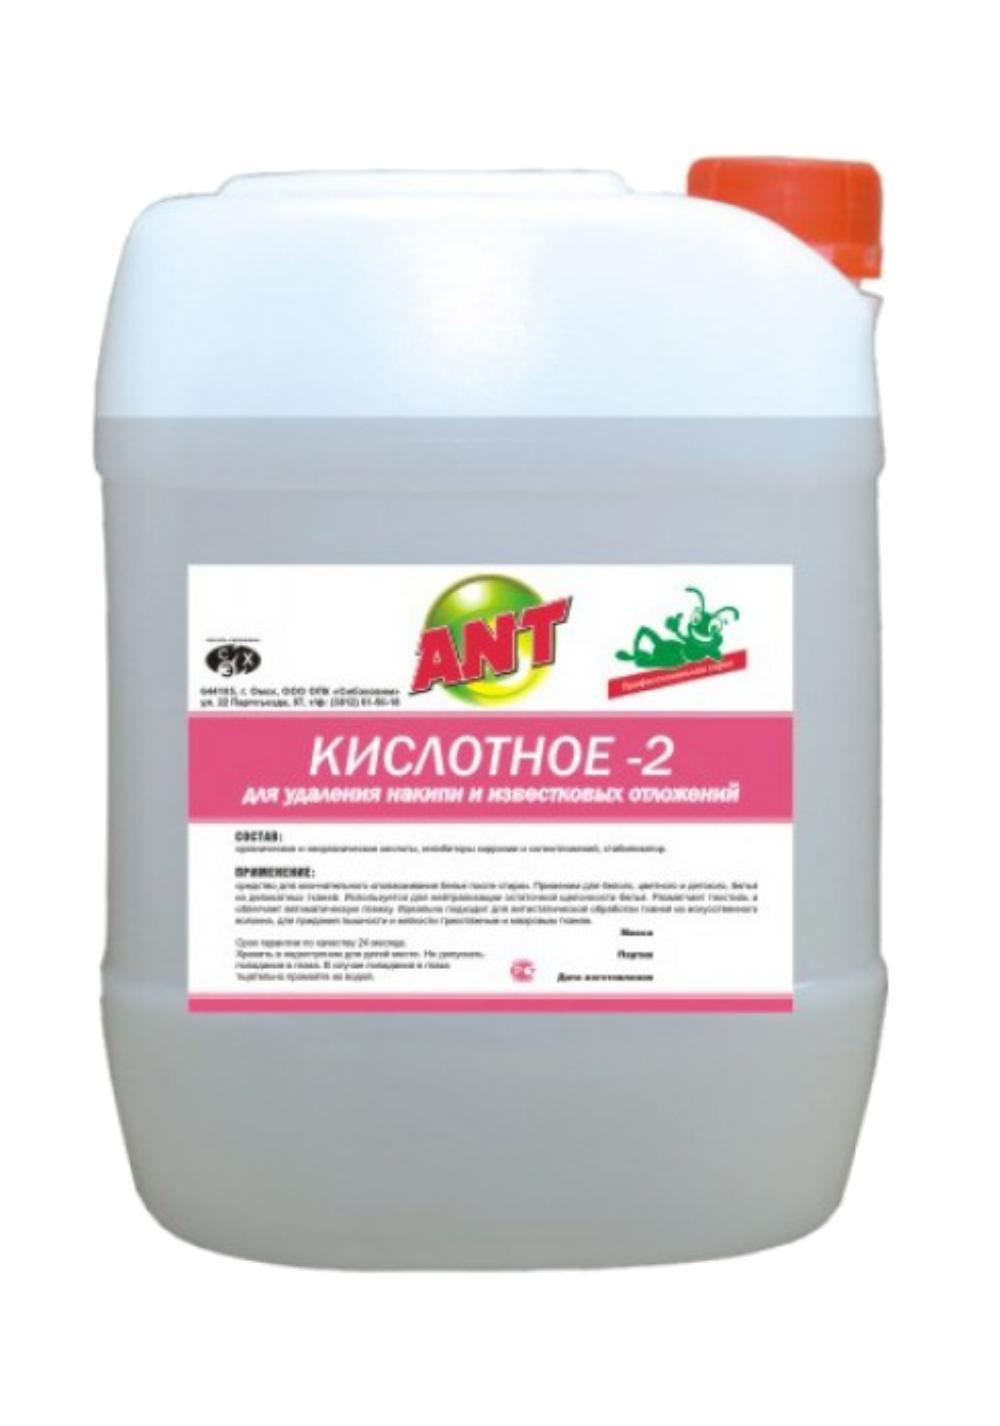 ANT Кислотное-2